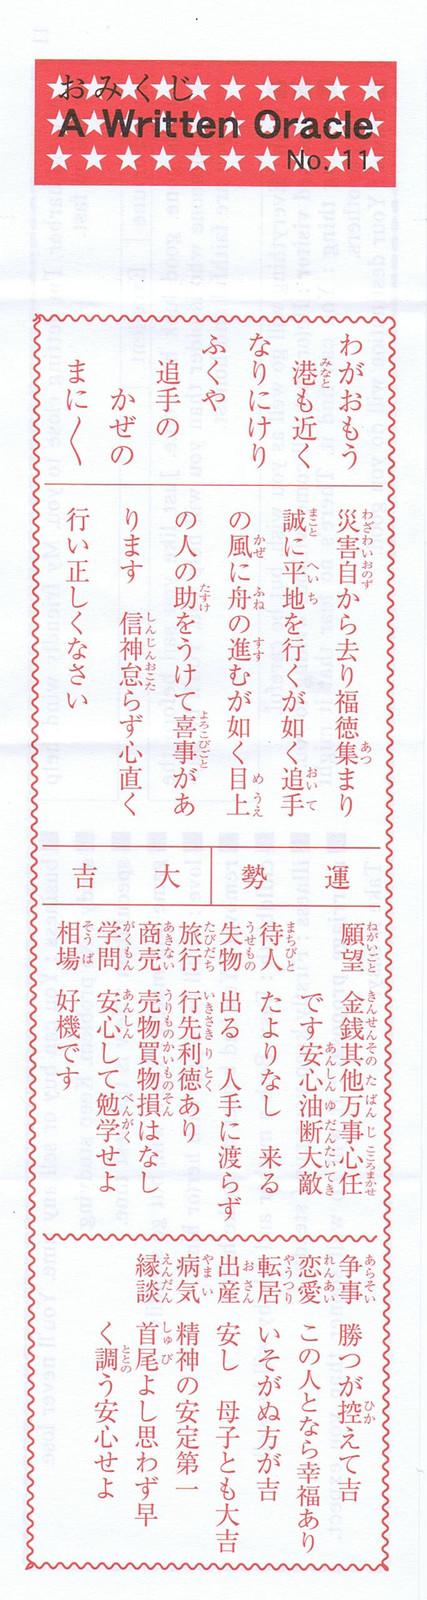 201420140101_00000